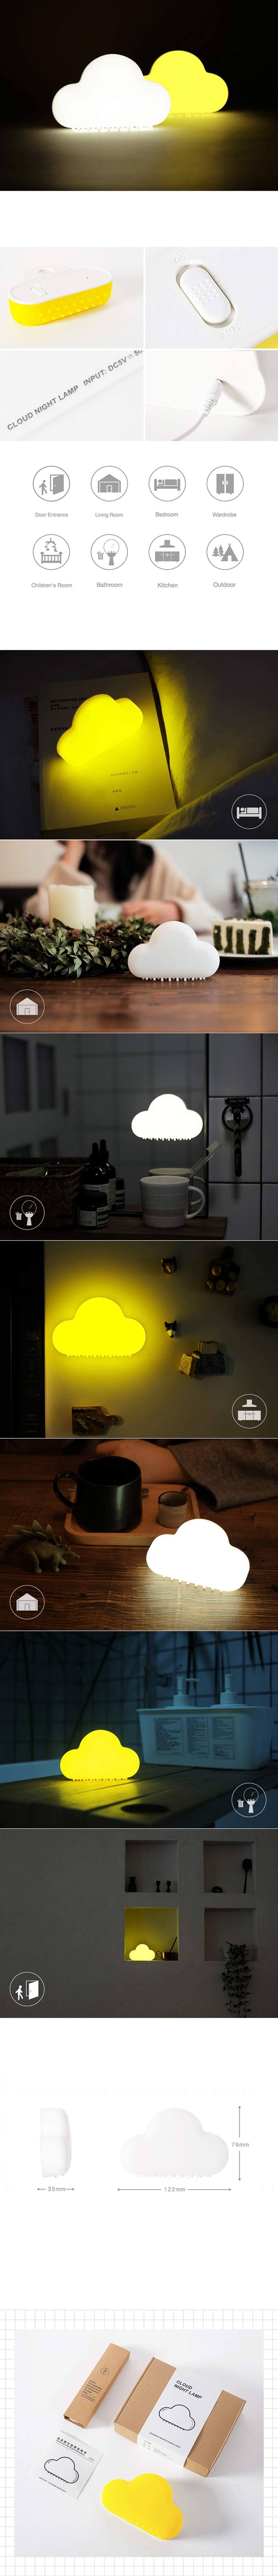 cloud-lamp-descripton-2.jpg